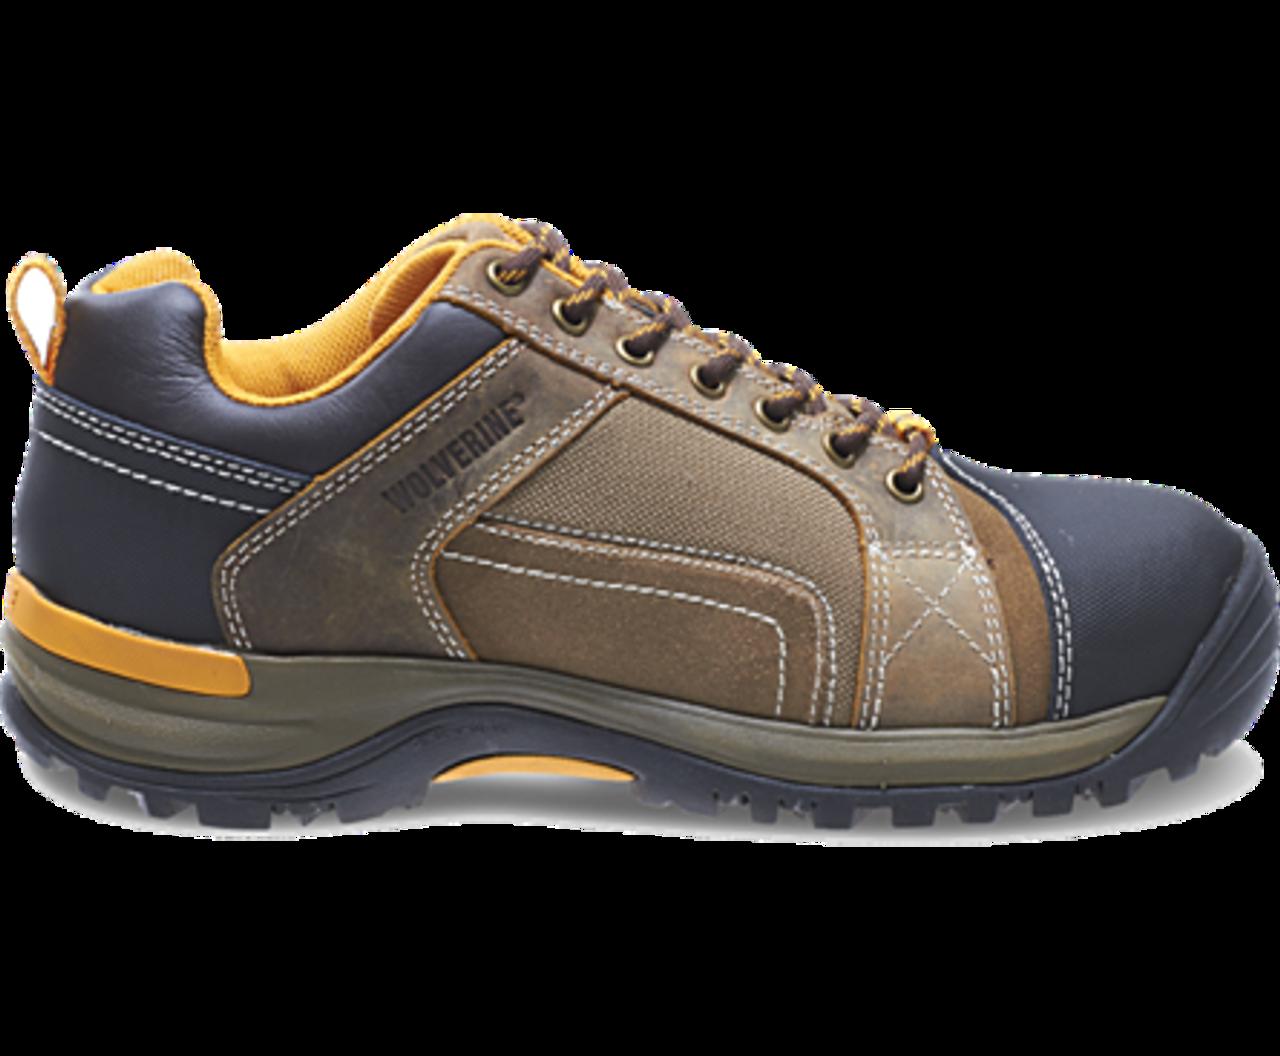 adc9b8c3ac1 Wolverine W10240 Mens Chisel Low-Cut Steel-Toe Electrical Hazard Work Shoe